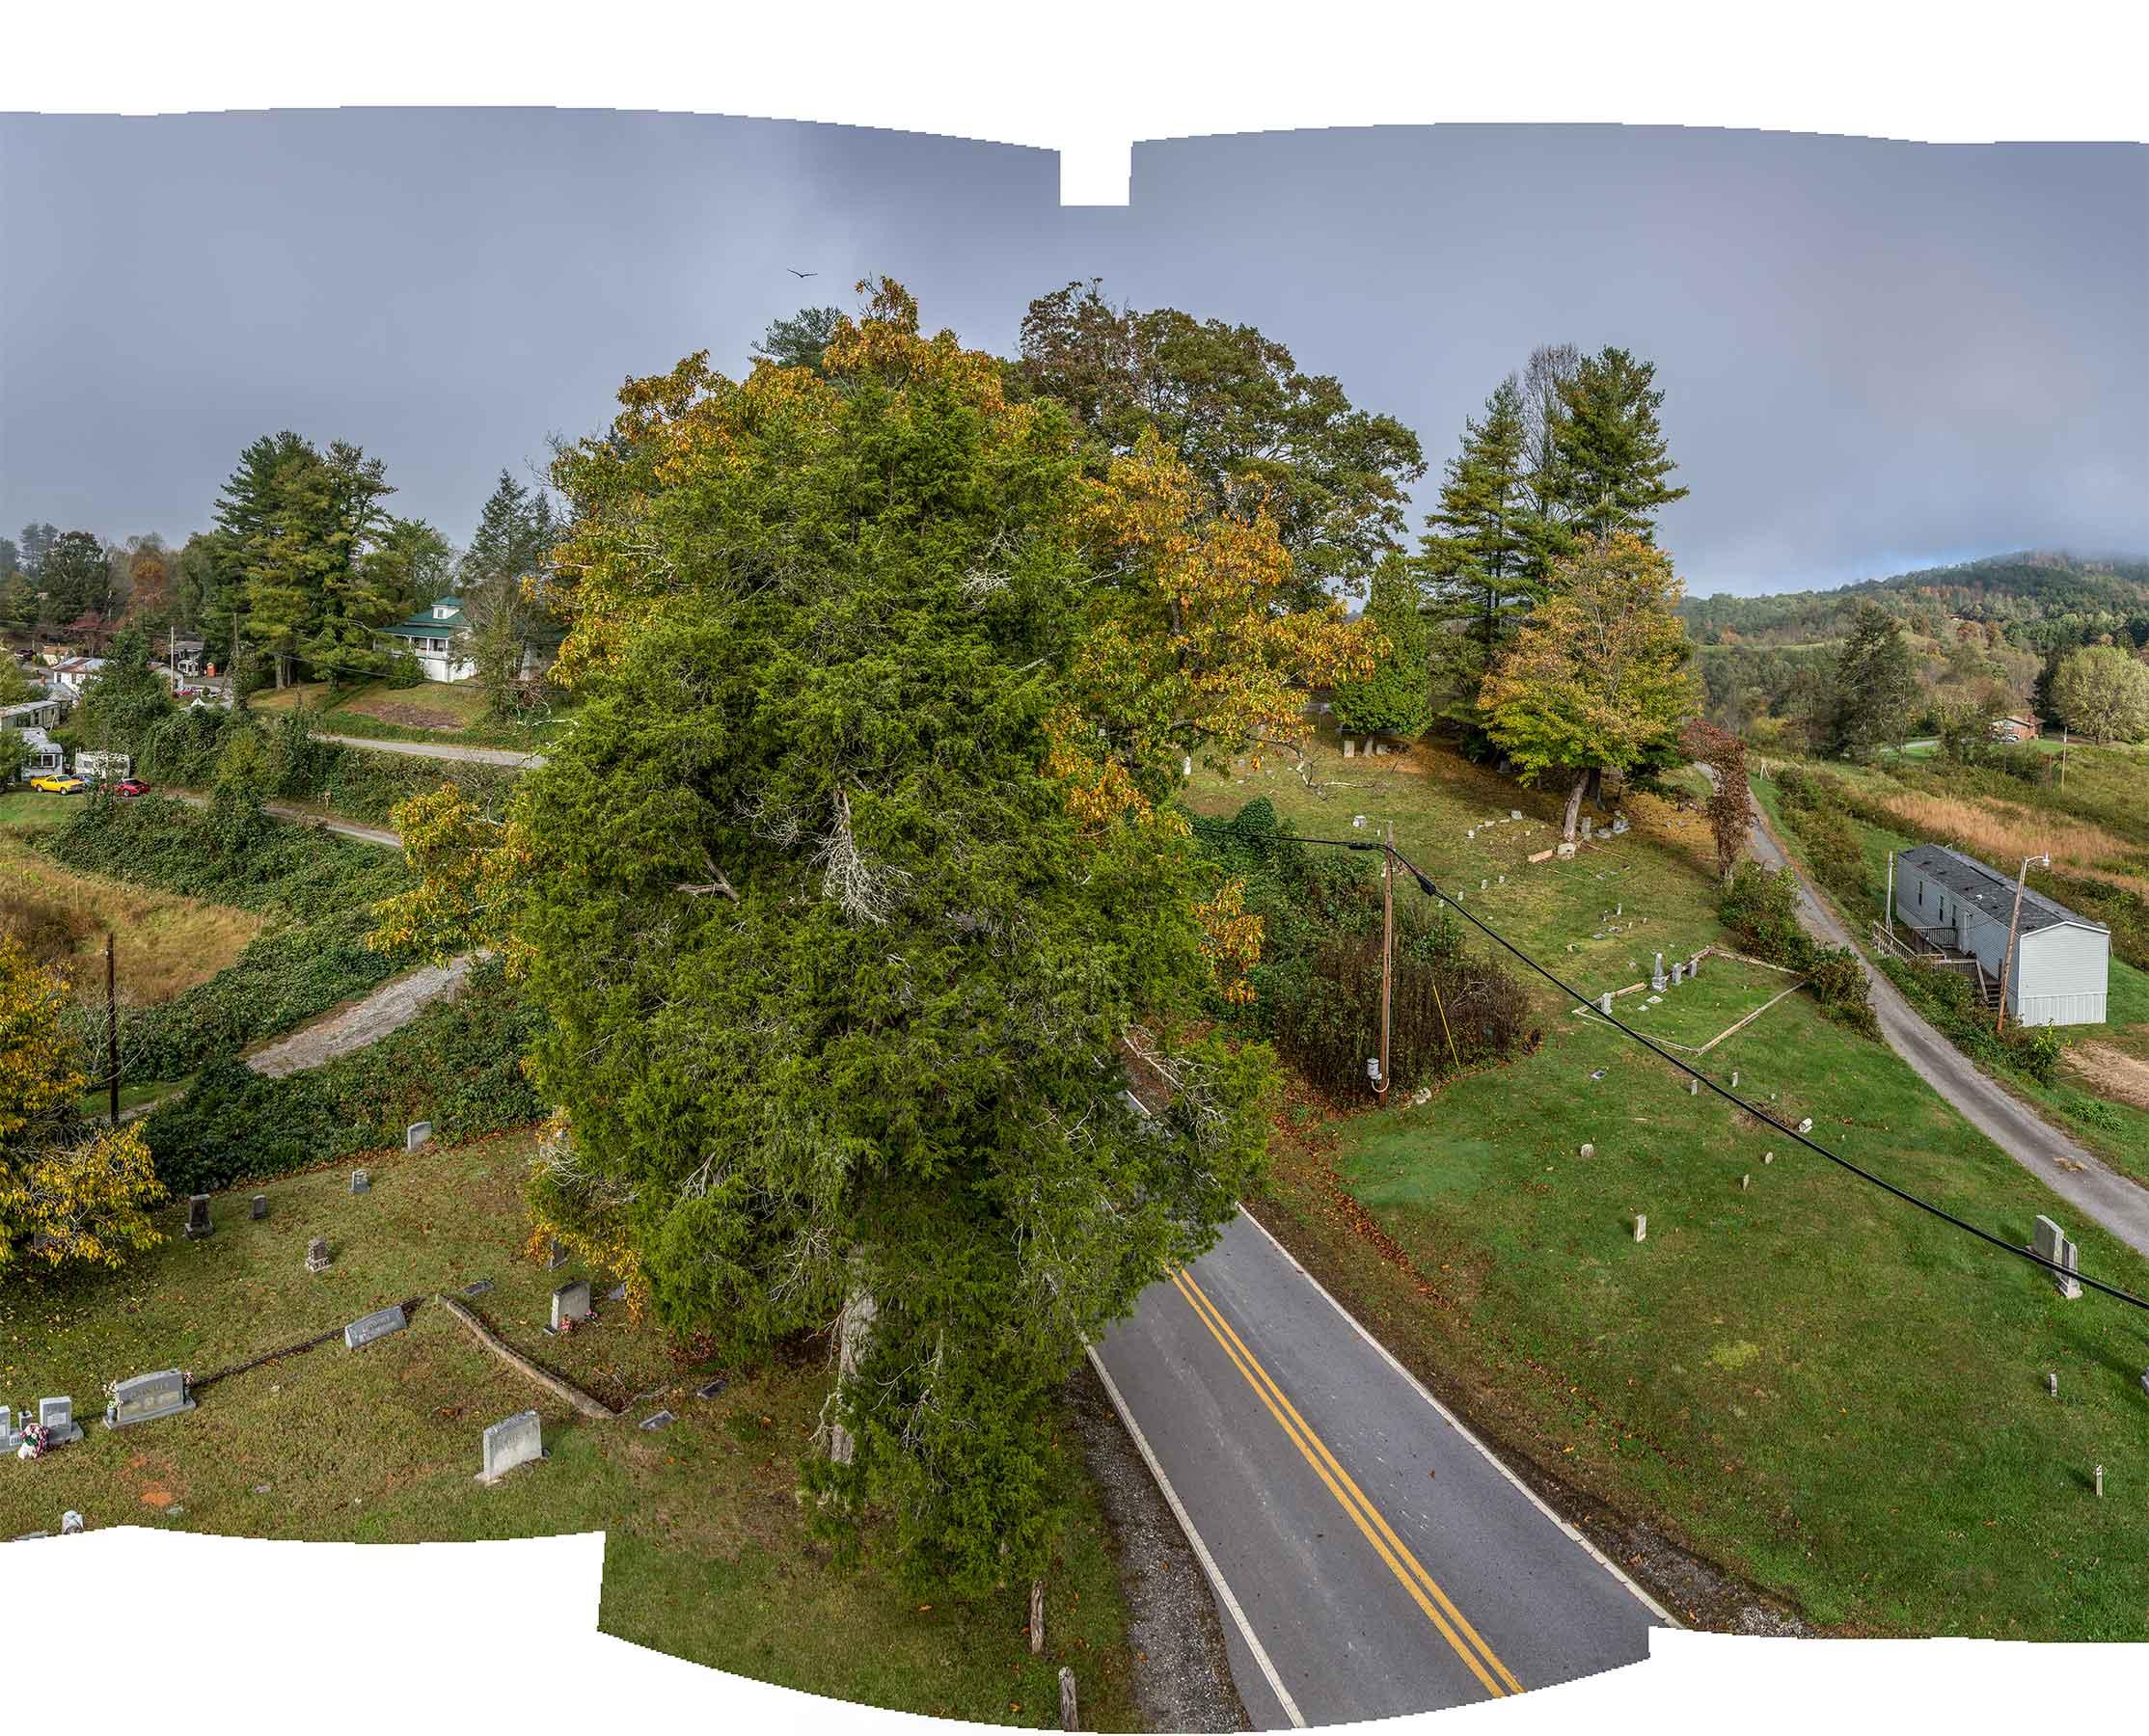 Madison-crossroads-03.jpg